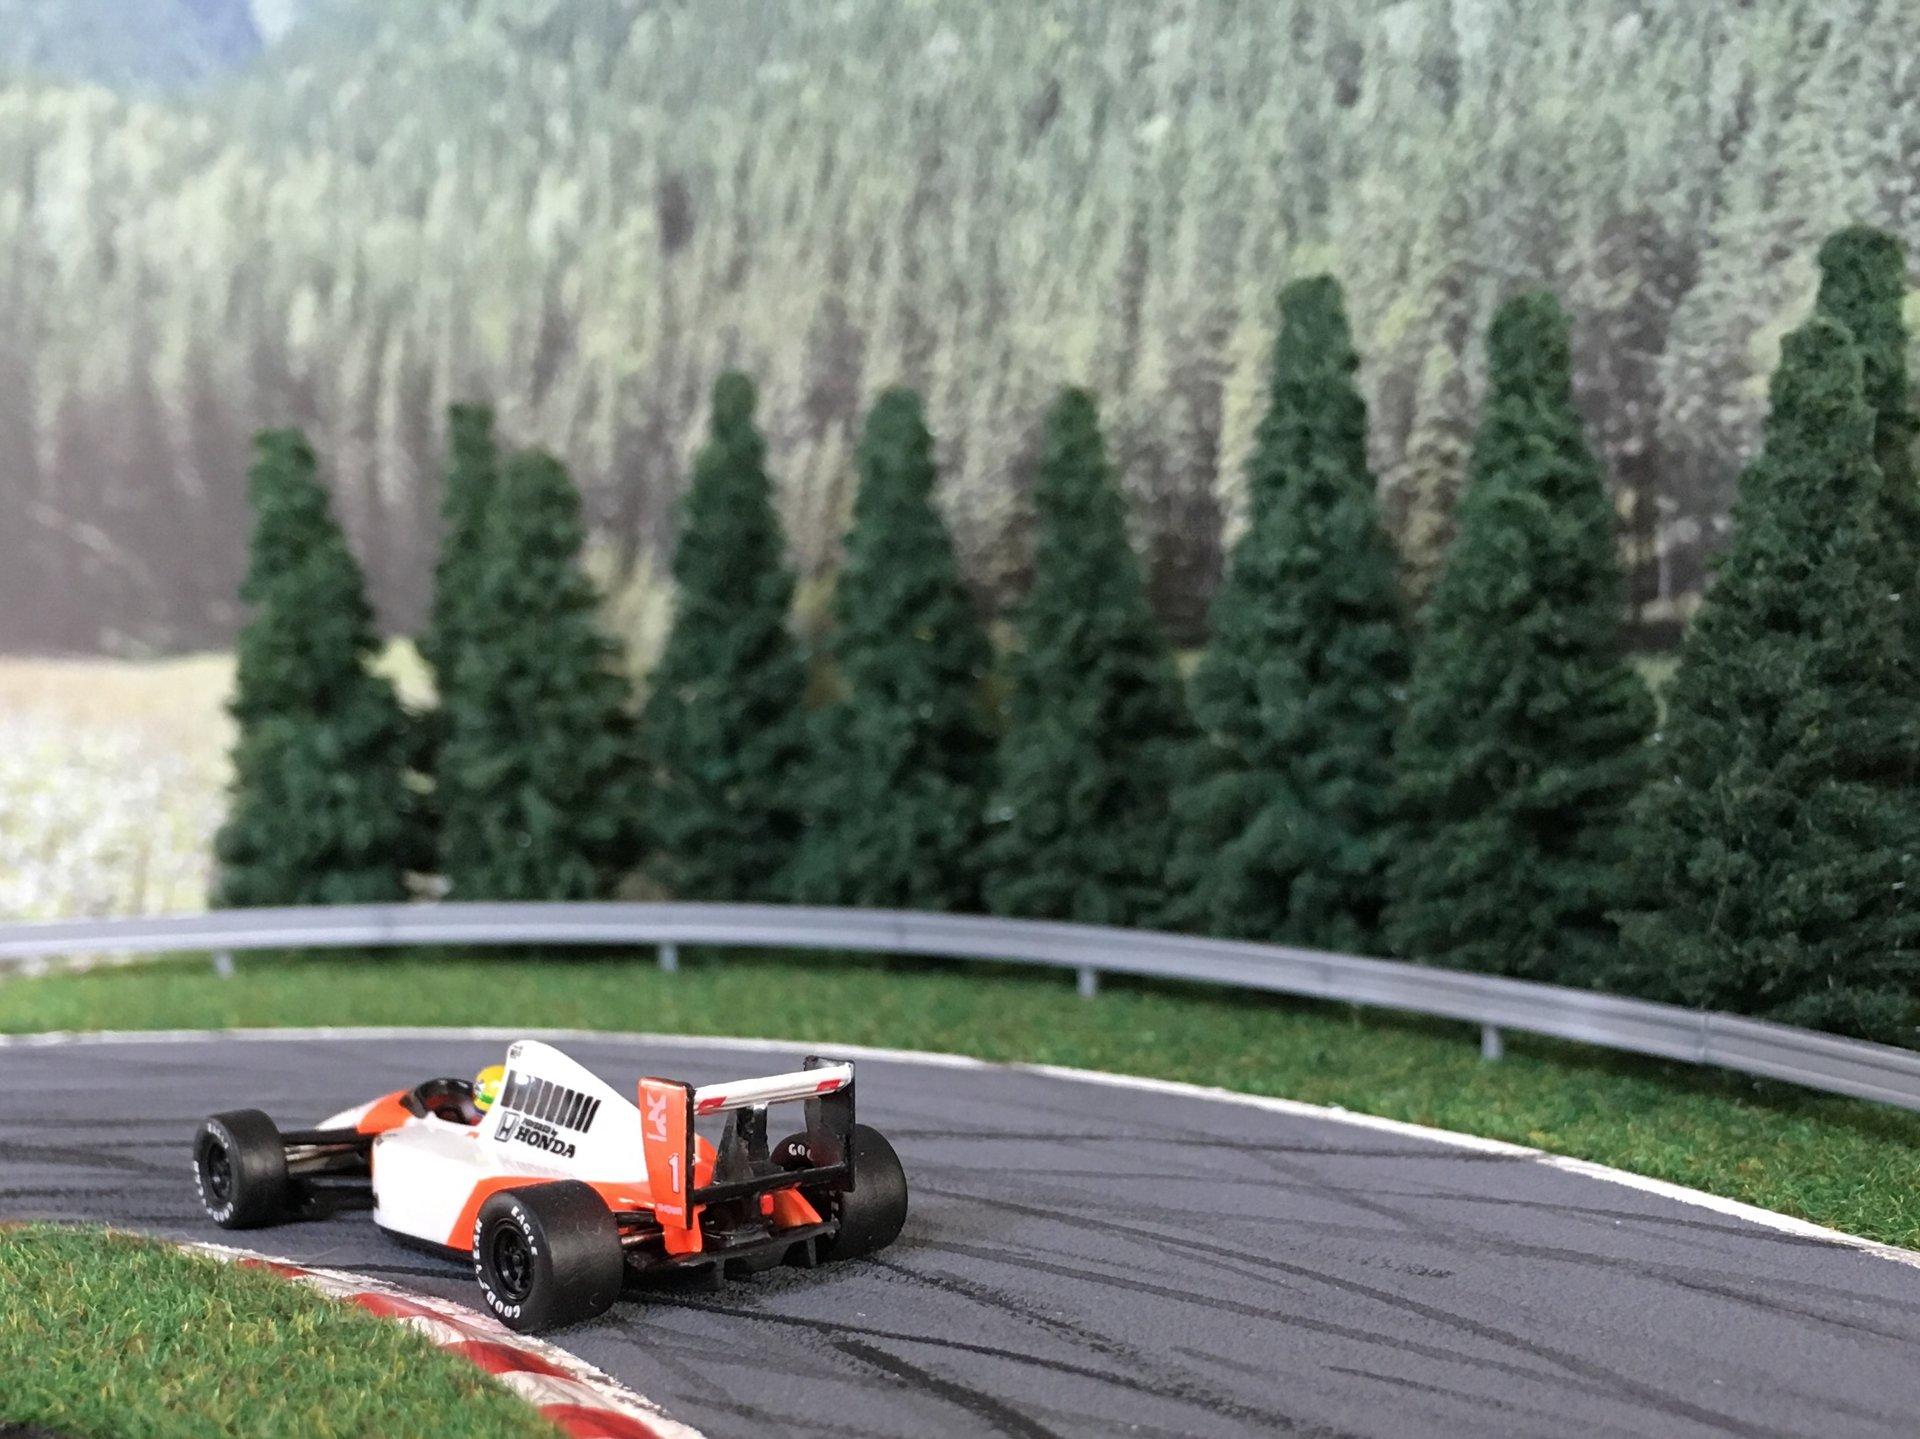 McLaren MP 4-6 Senna 008.jpg